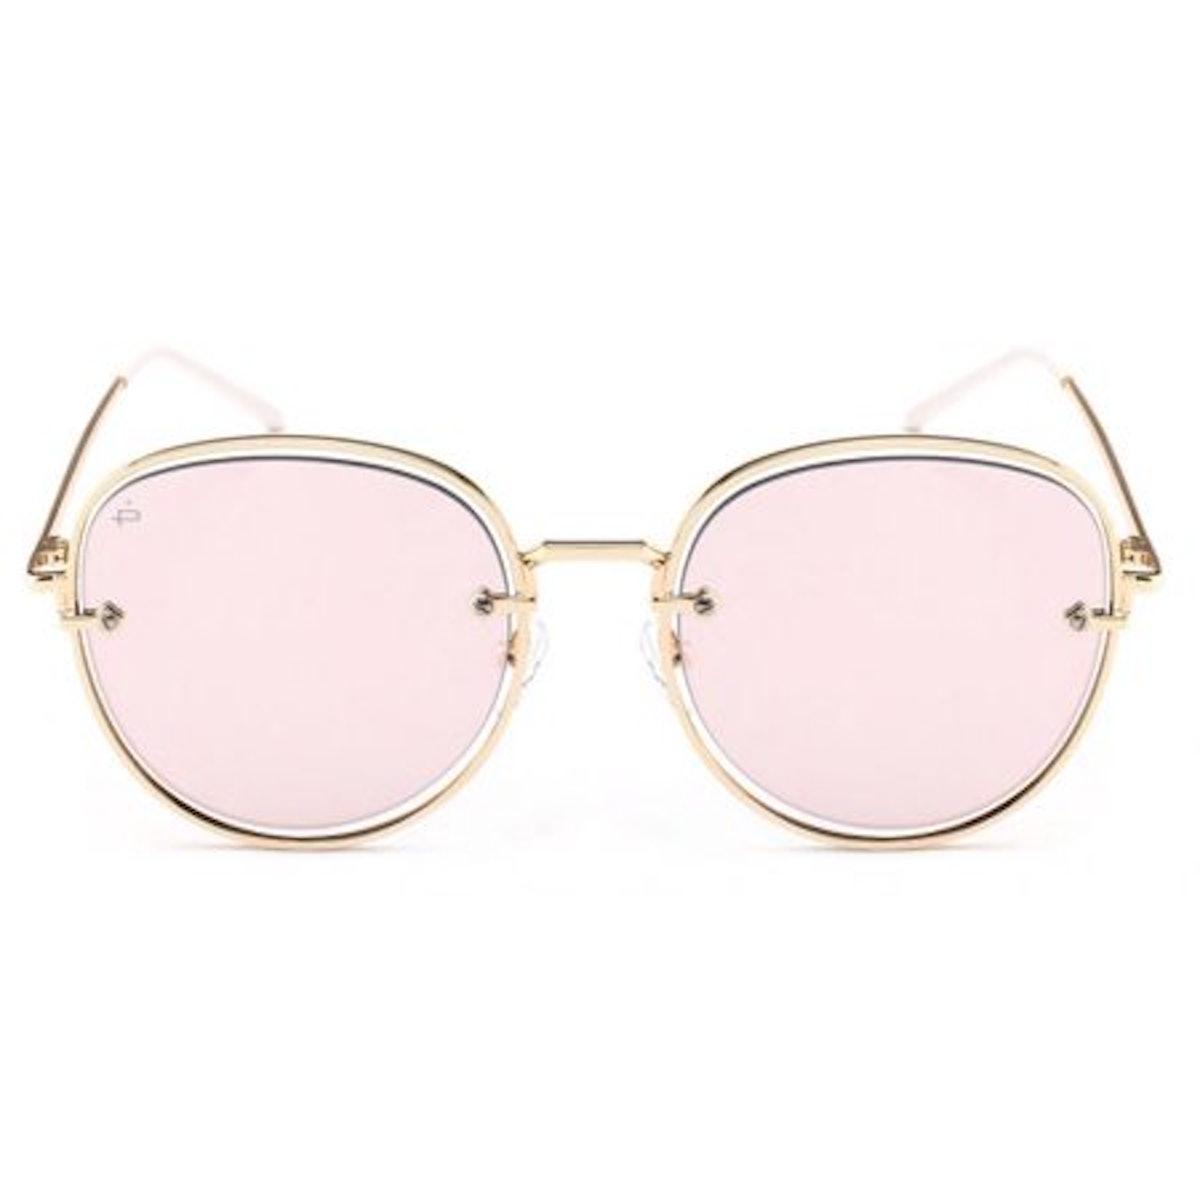 "Prive Revaux ""The Escobar"" Sunglasses"